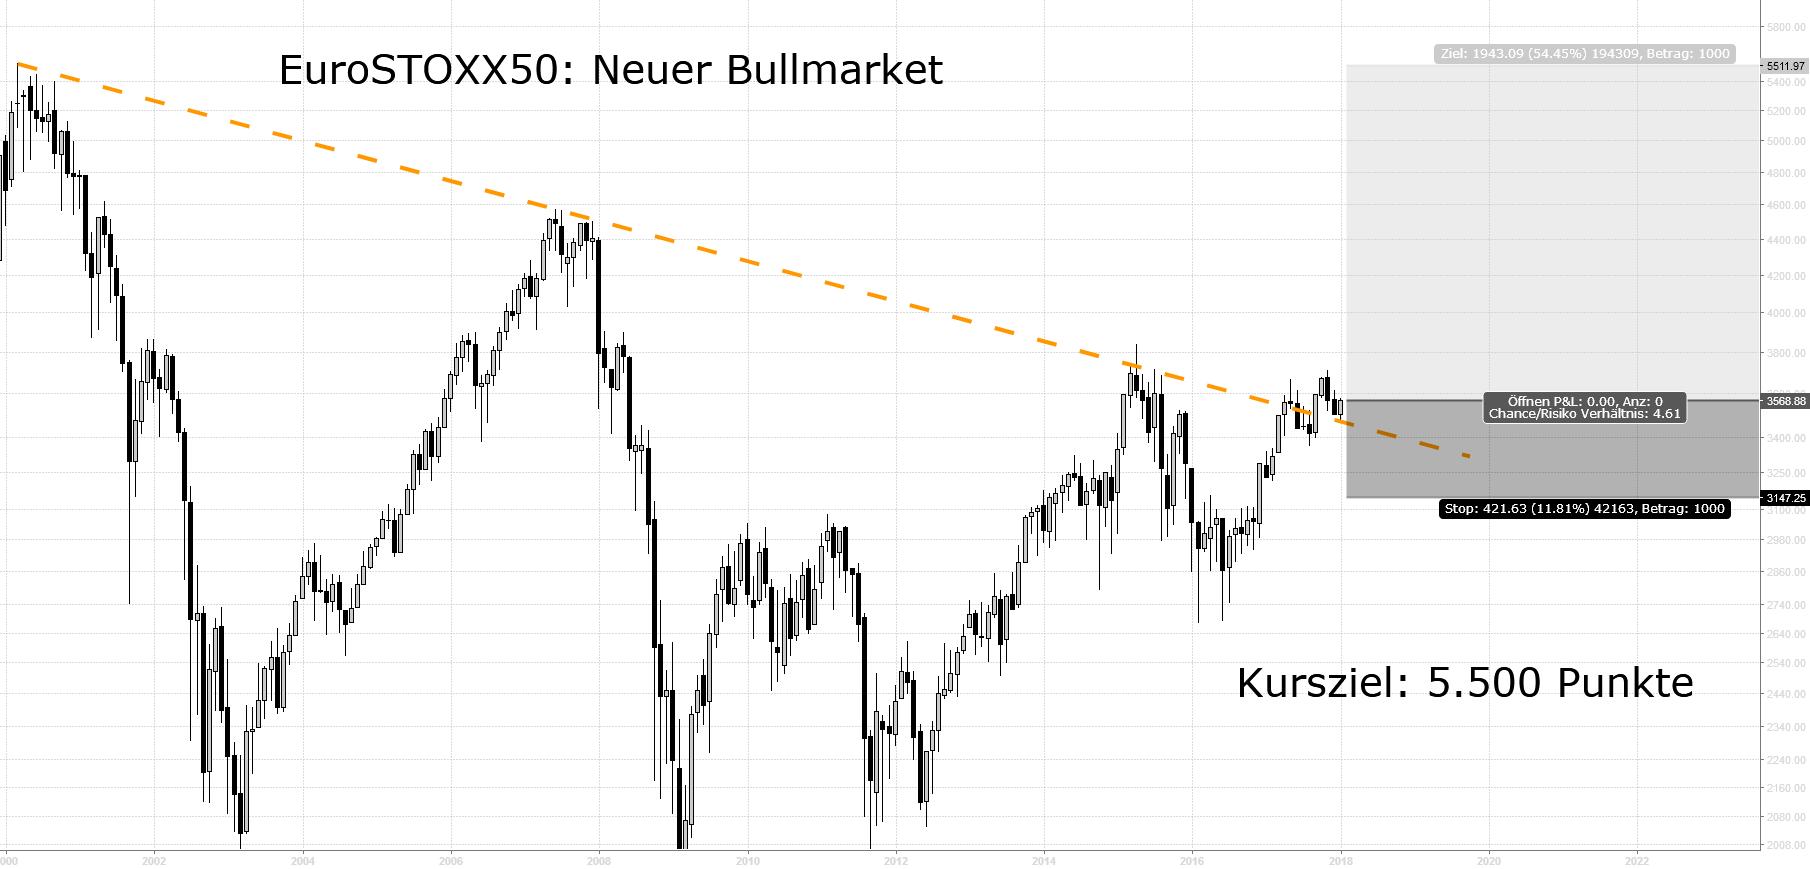 EuroSTOXX50: Neuer Bullmarket, Kursziel 5.500 Punkte